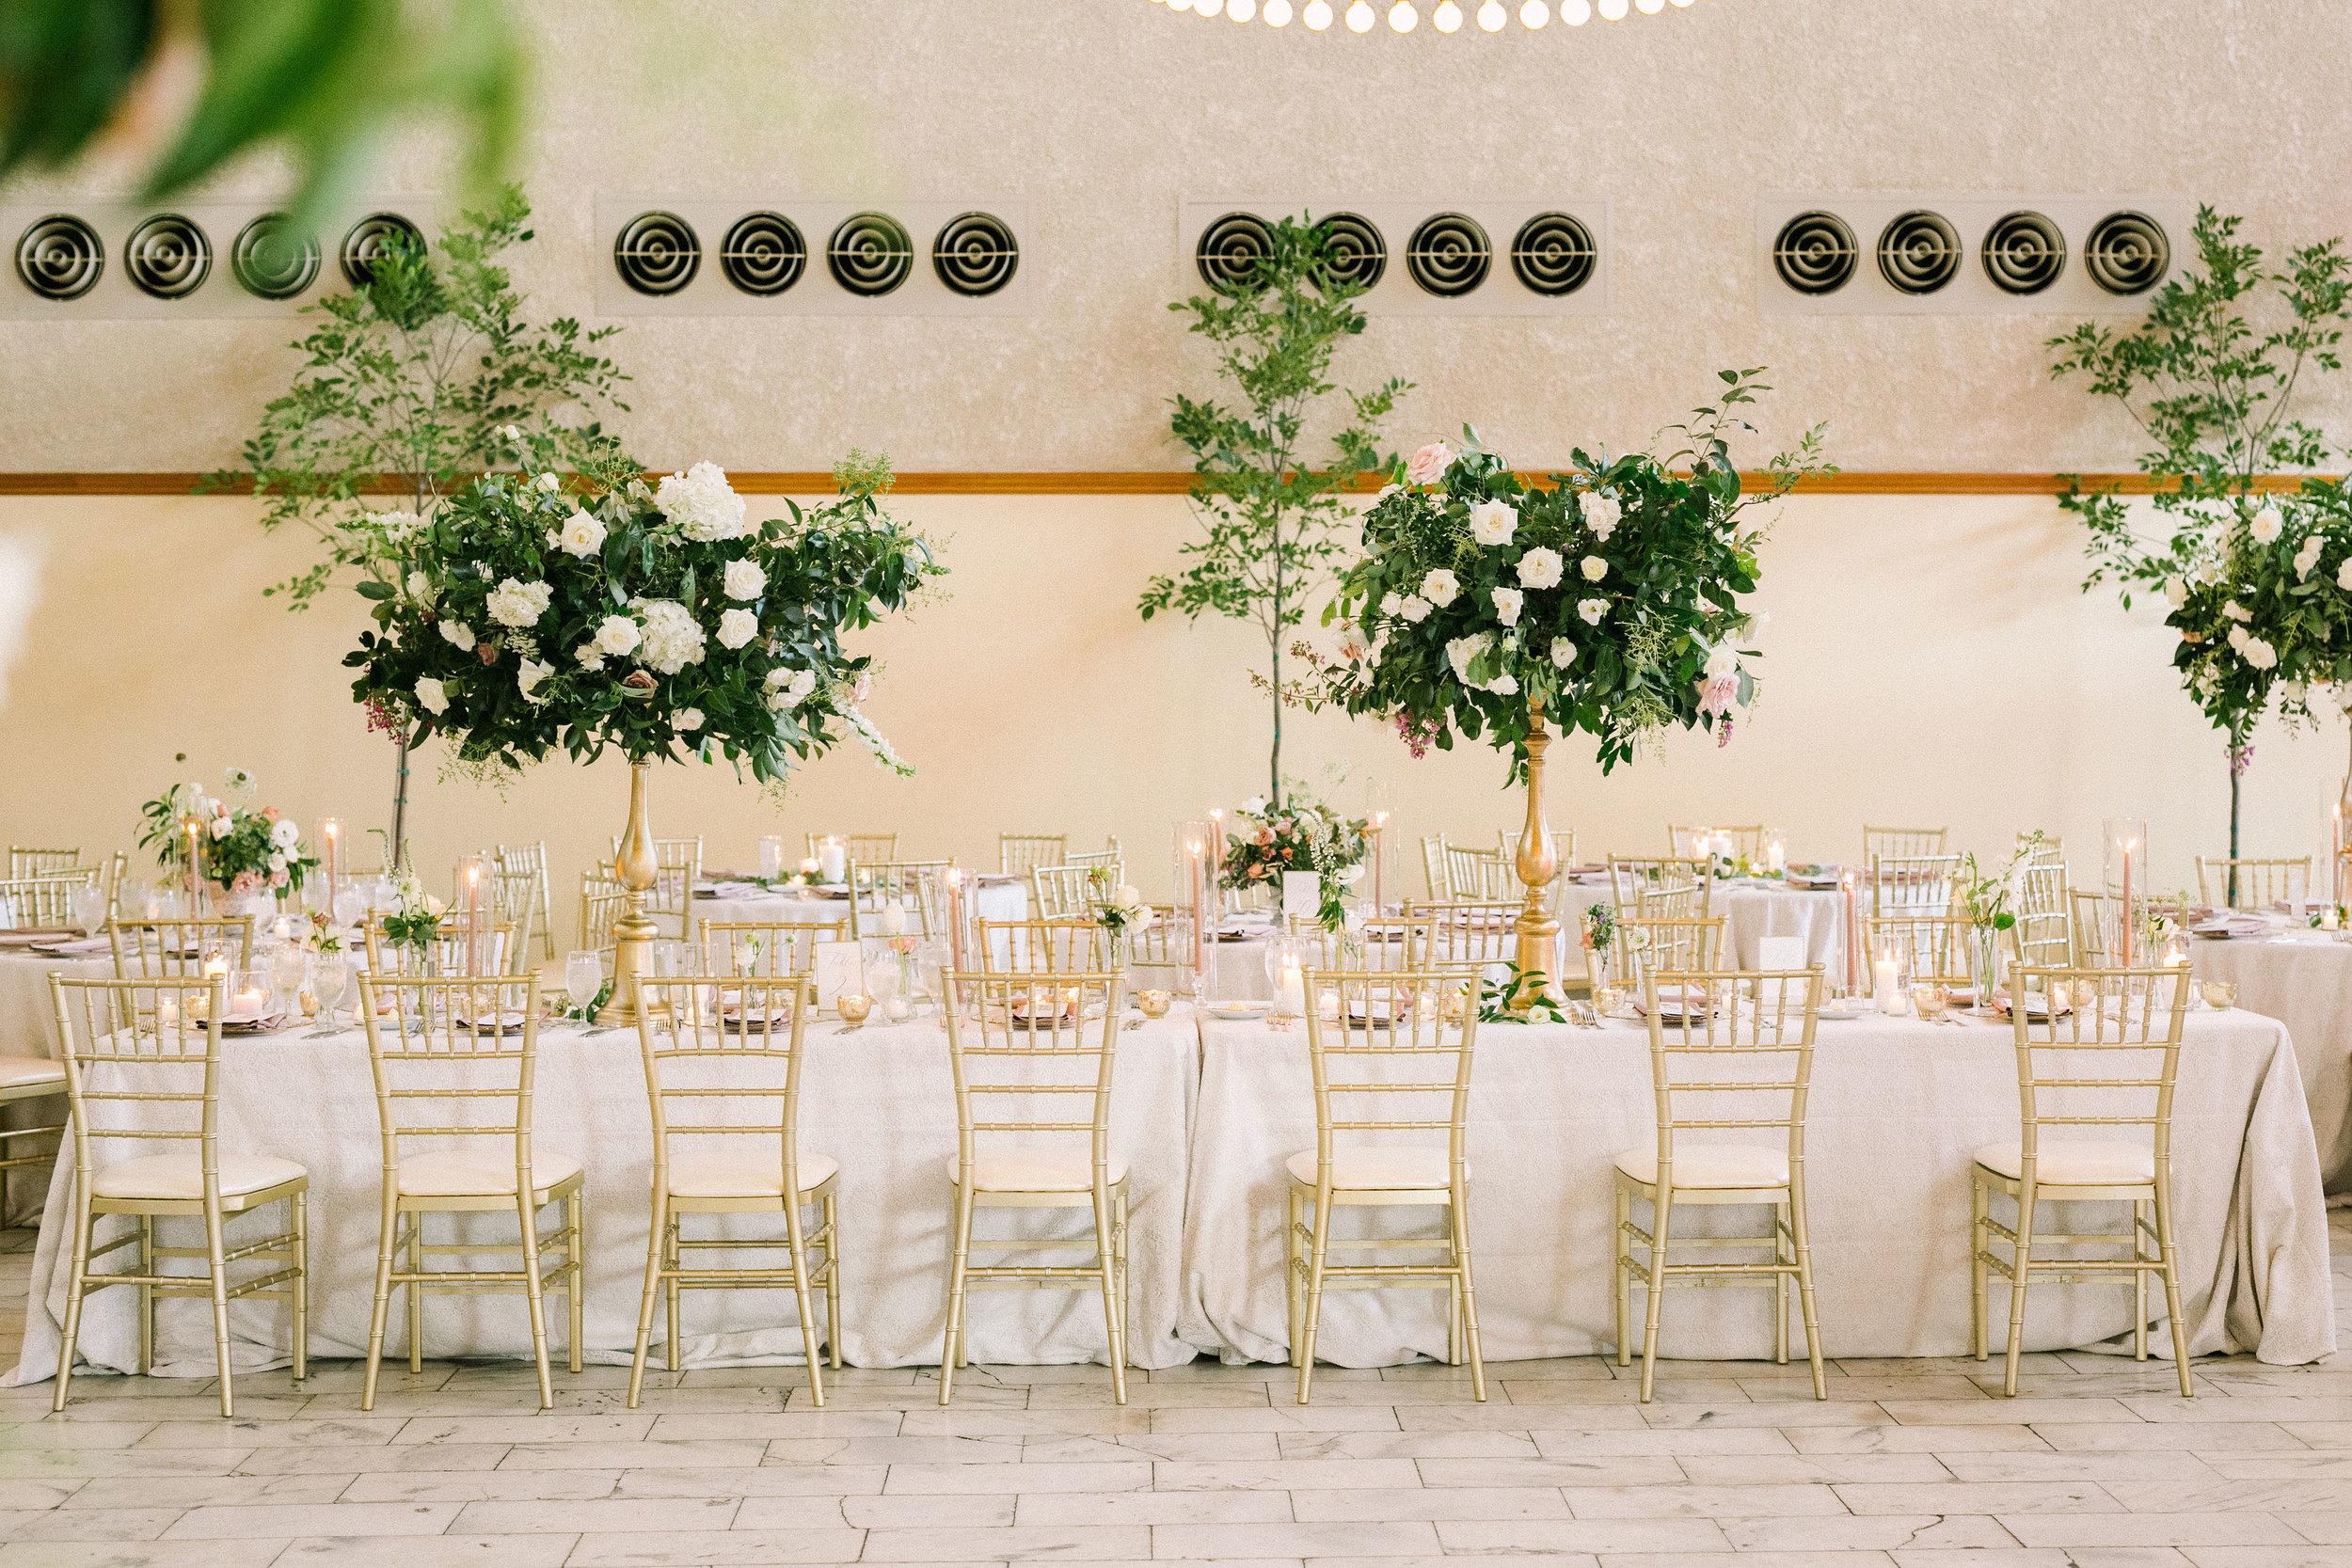 Ellen-Ashton-Photography-Girt-and-gold-events-weddings-Ashton-Depot-Weddings1048.jpg